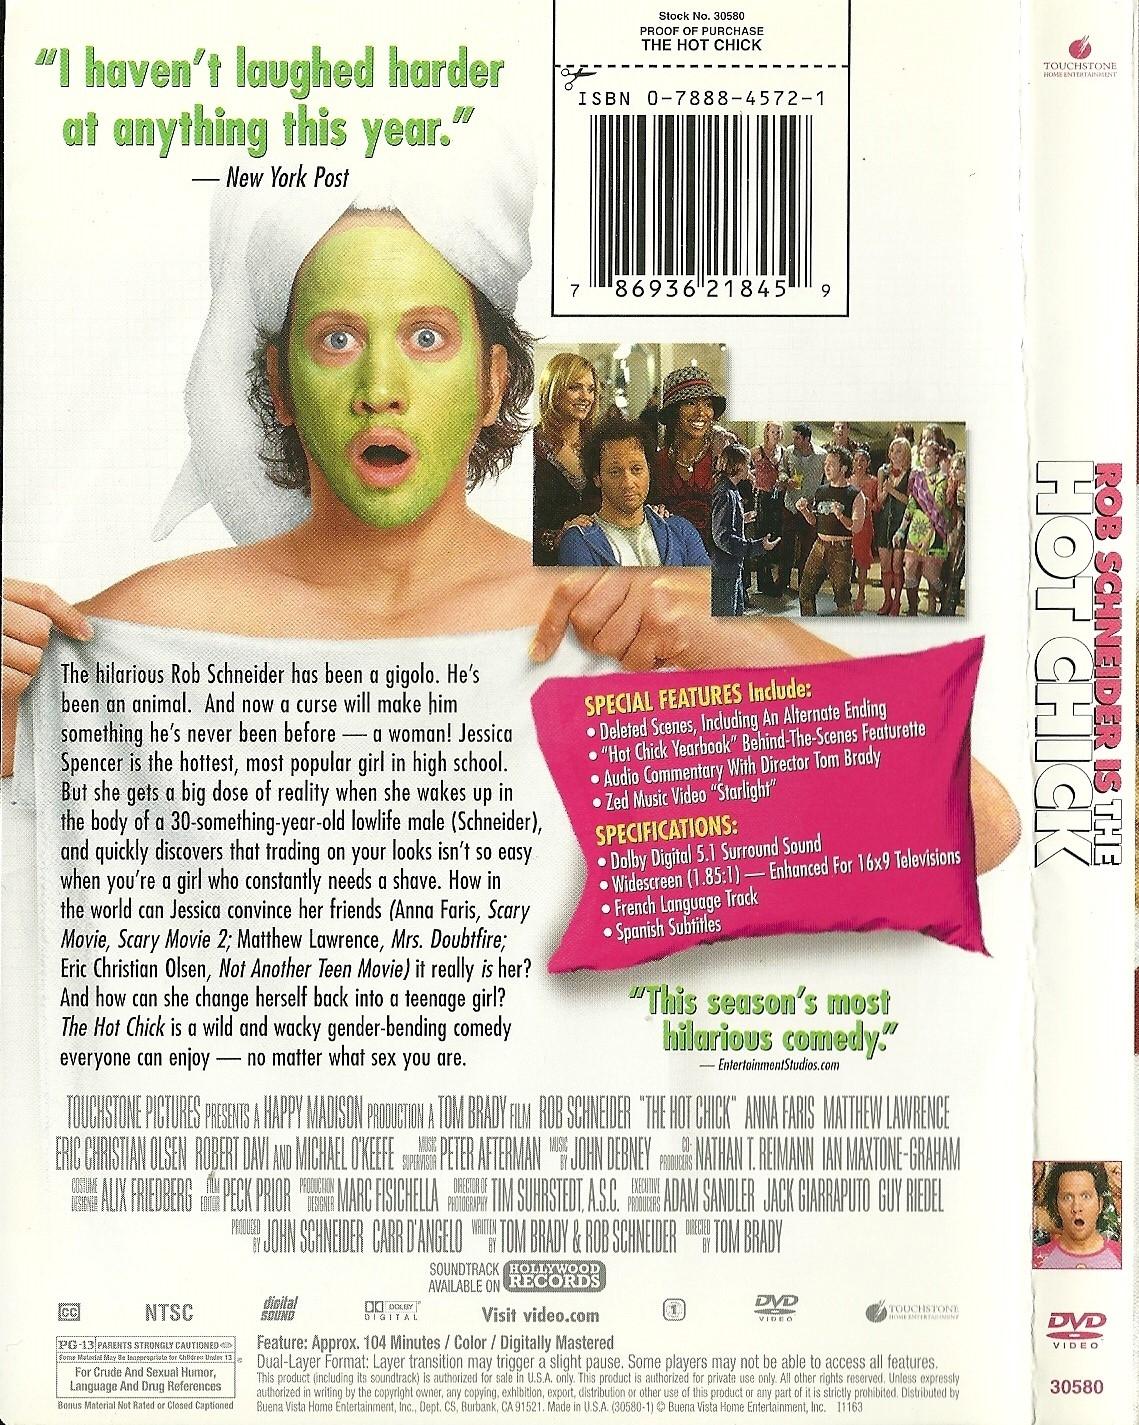 The Hot Chick DVD Rob Schneider Anna Faris Rachel McAdams Adam Sandler